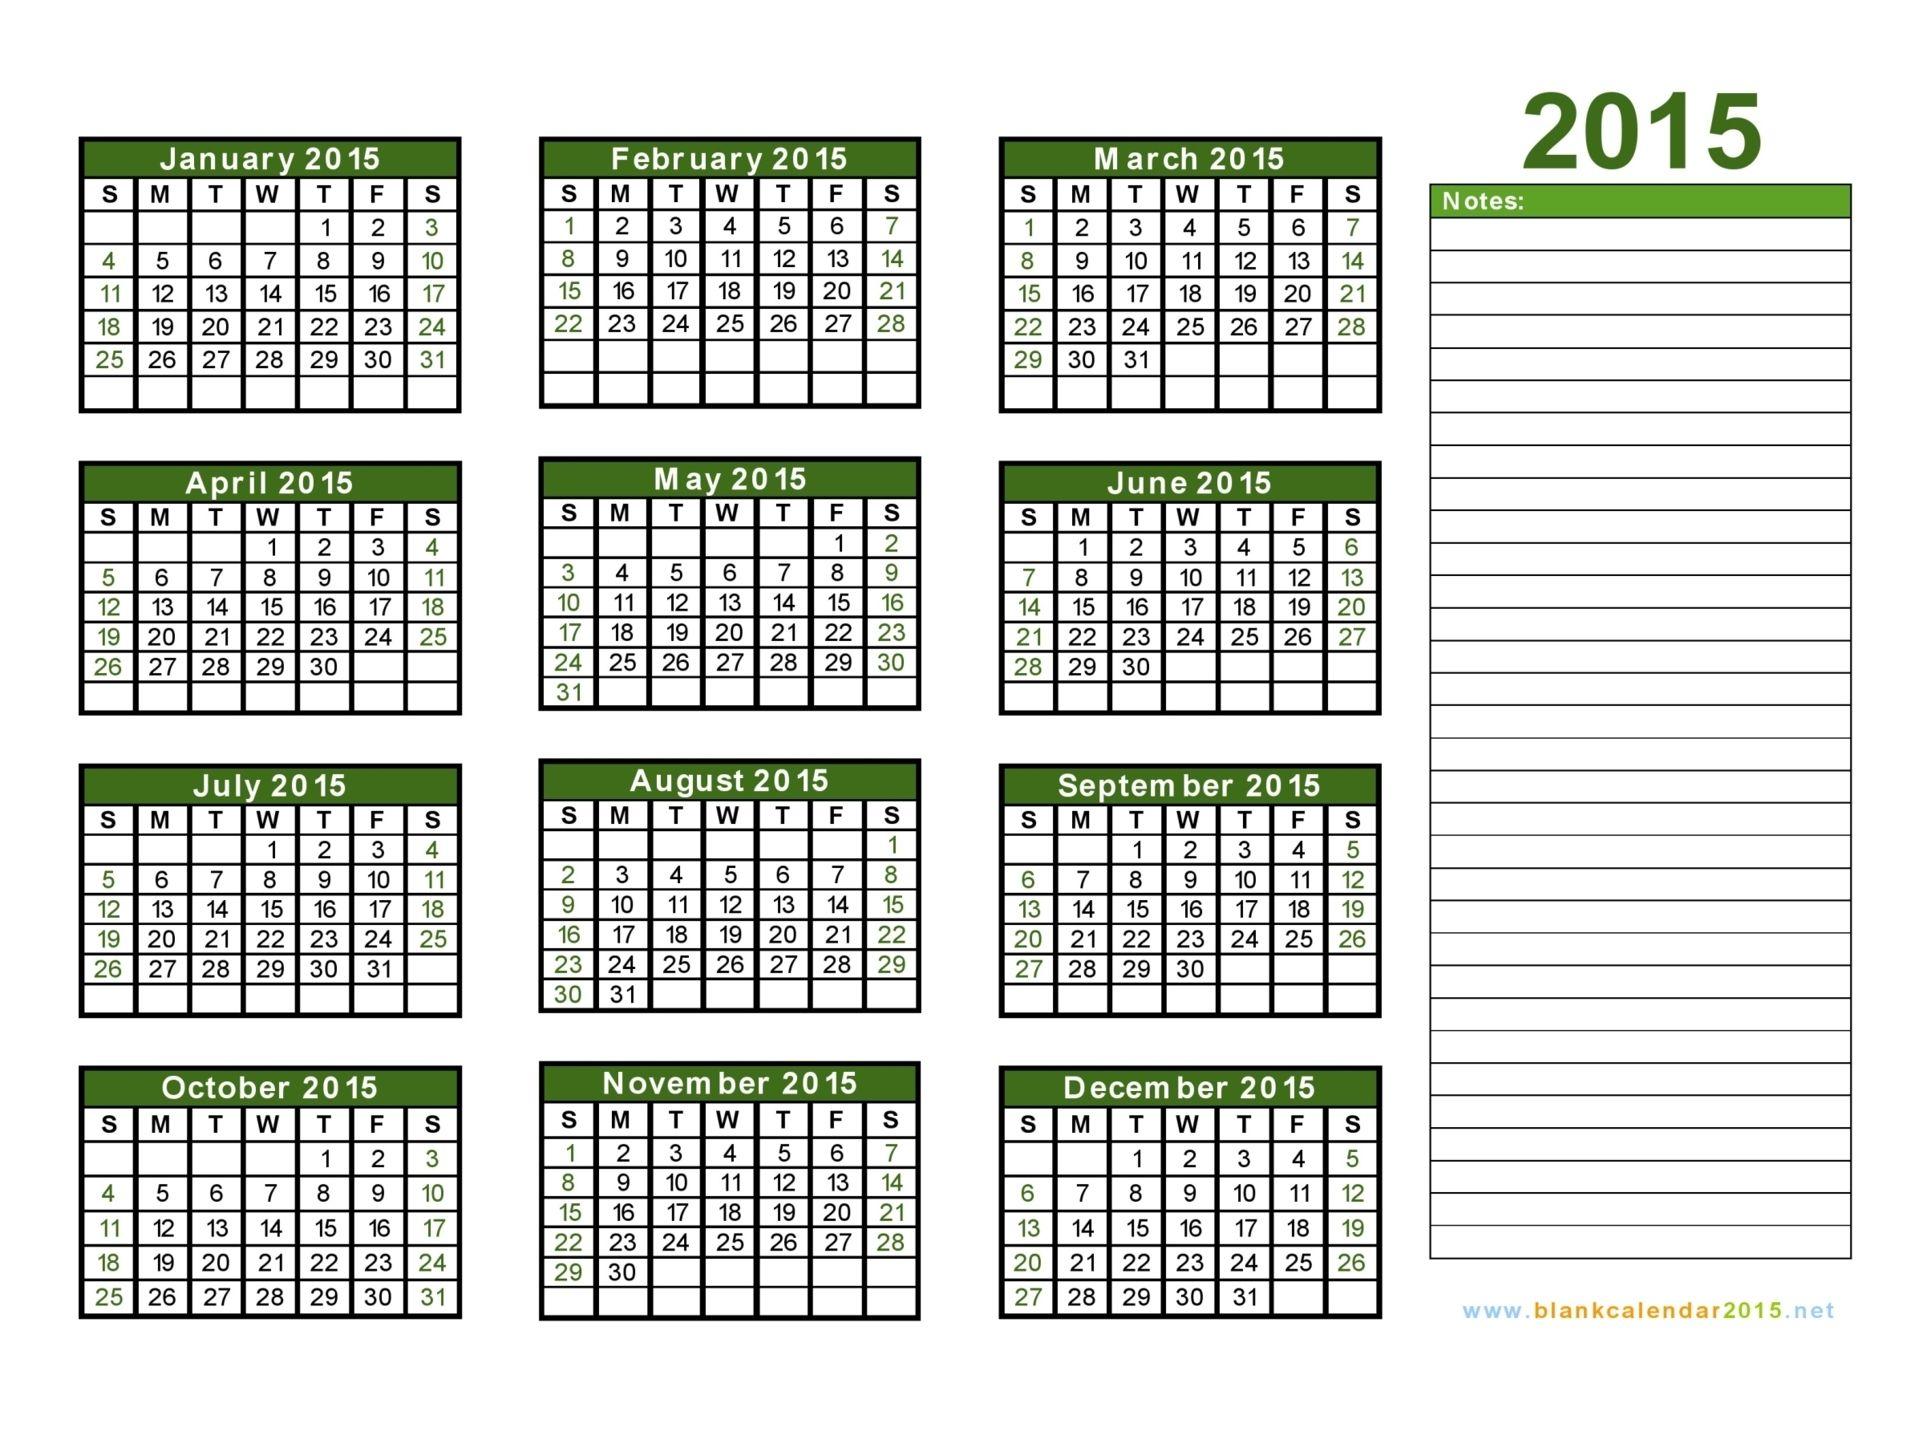 2015 calendars | Blank Calendar 2015 - Free Download Yearly Calendar ...